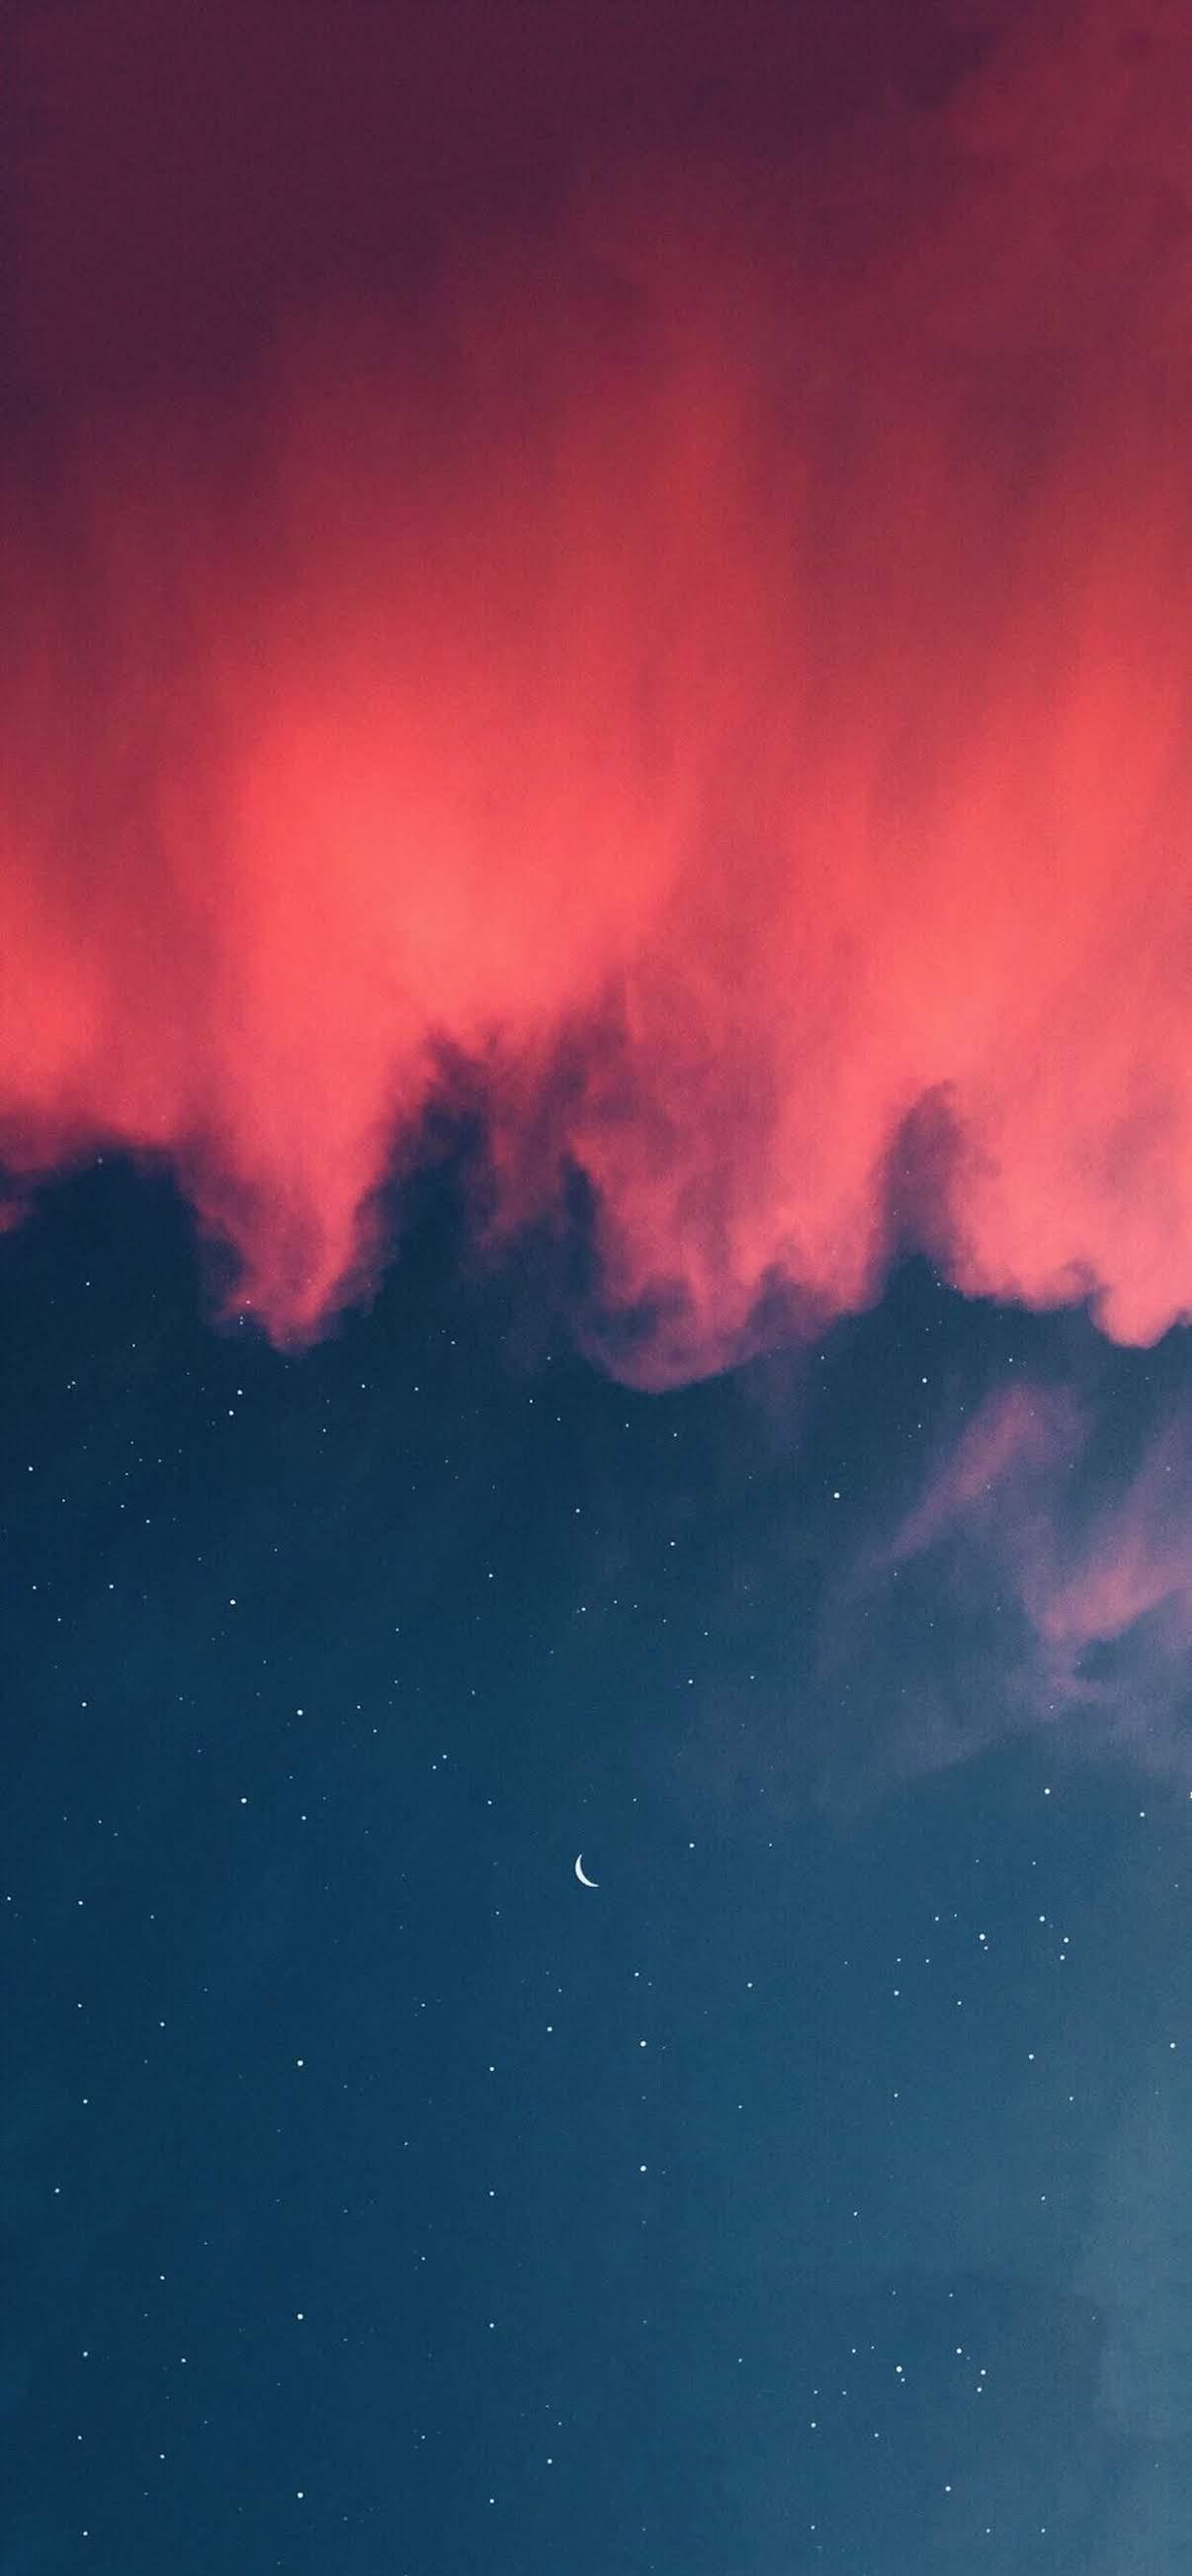 Smoke in the sky mobile wallpaper